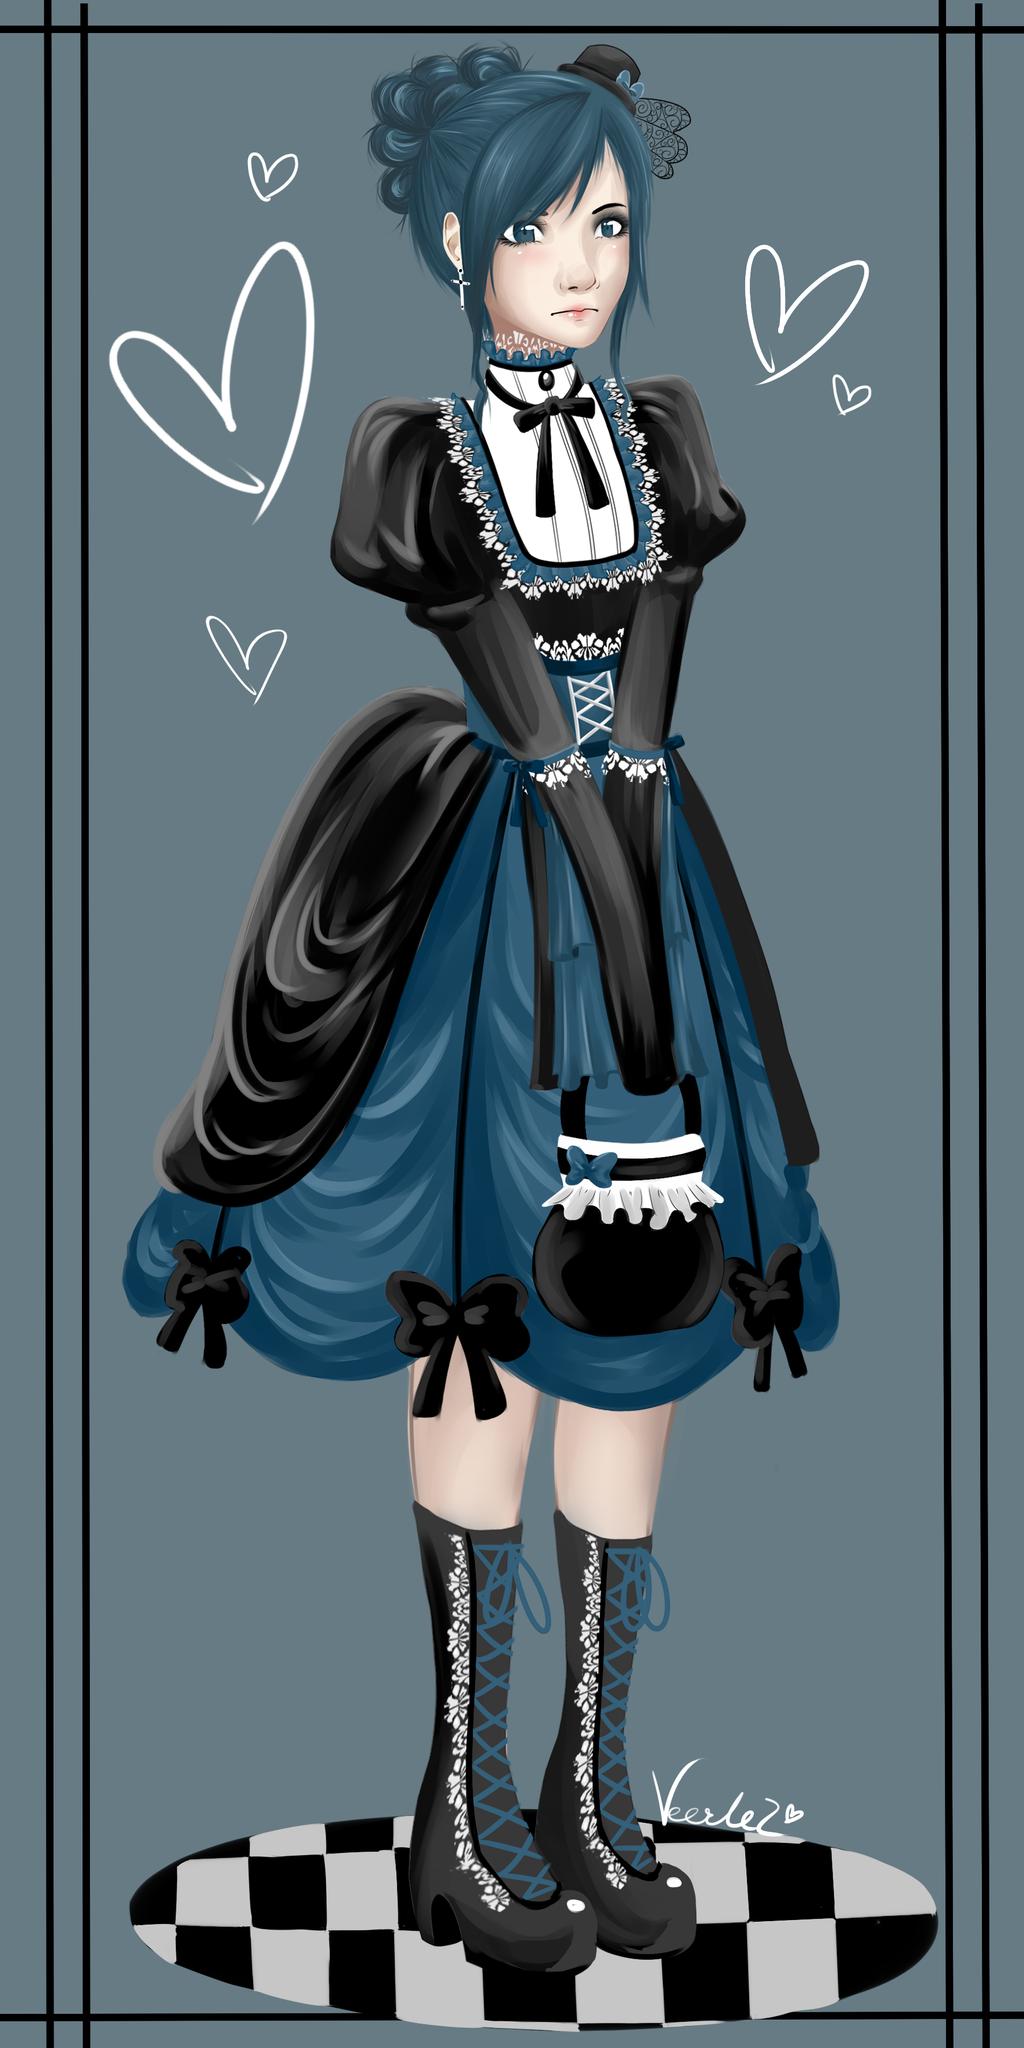 Victorian Girl by veerlez on DeviantArt